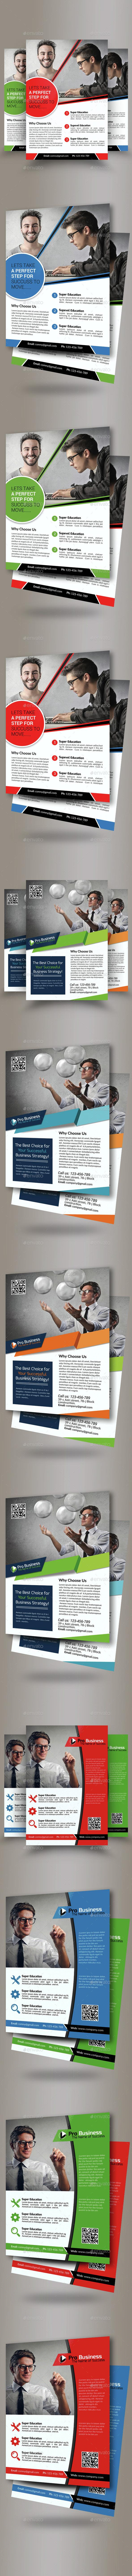 3 Business Corporate Agency Flyer Bundle  - Corporate Flyers